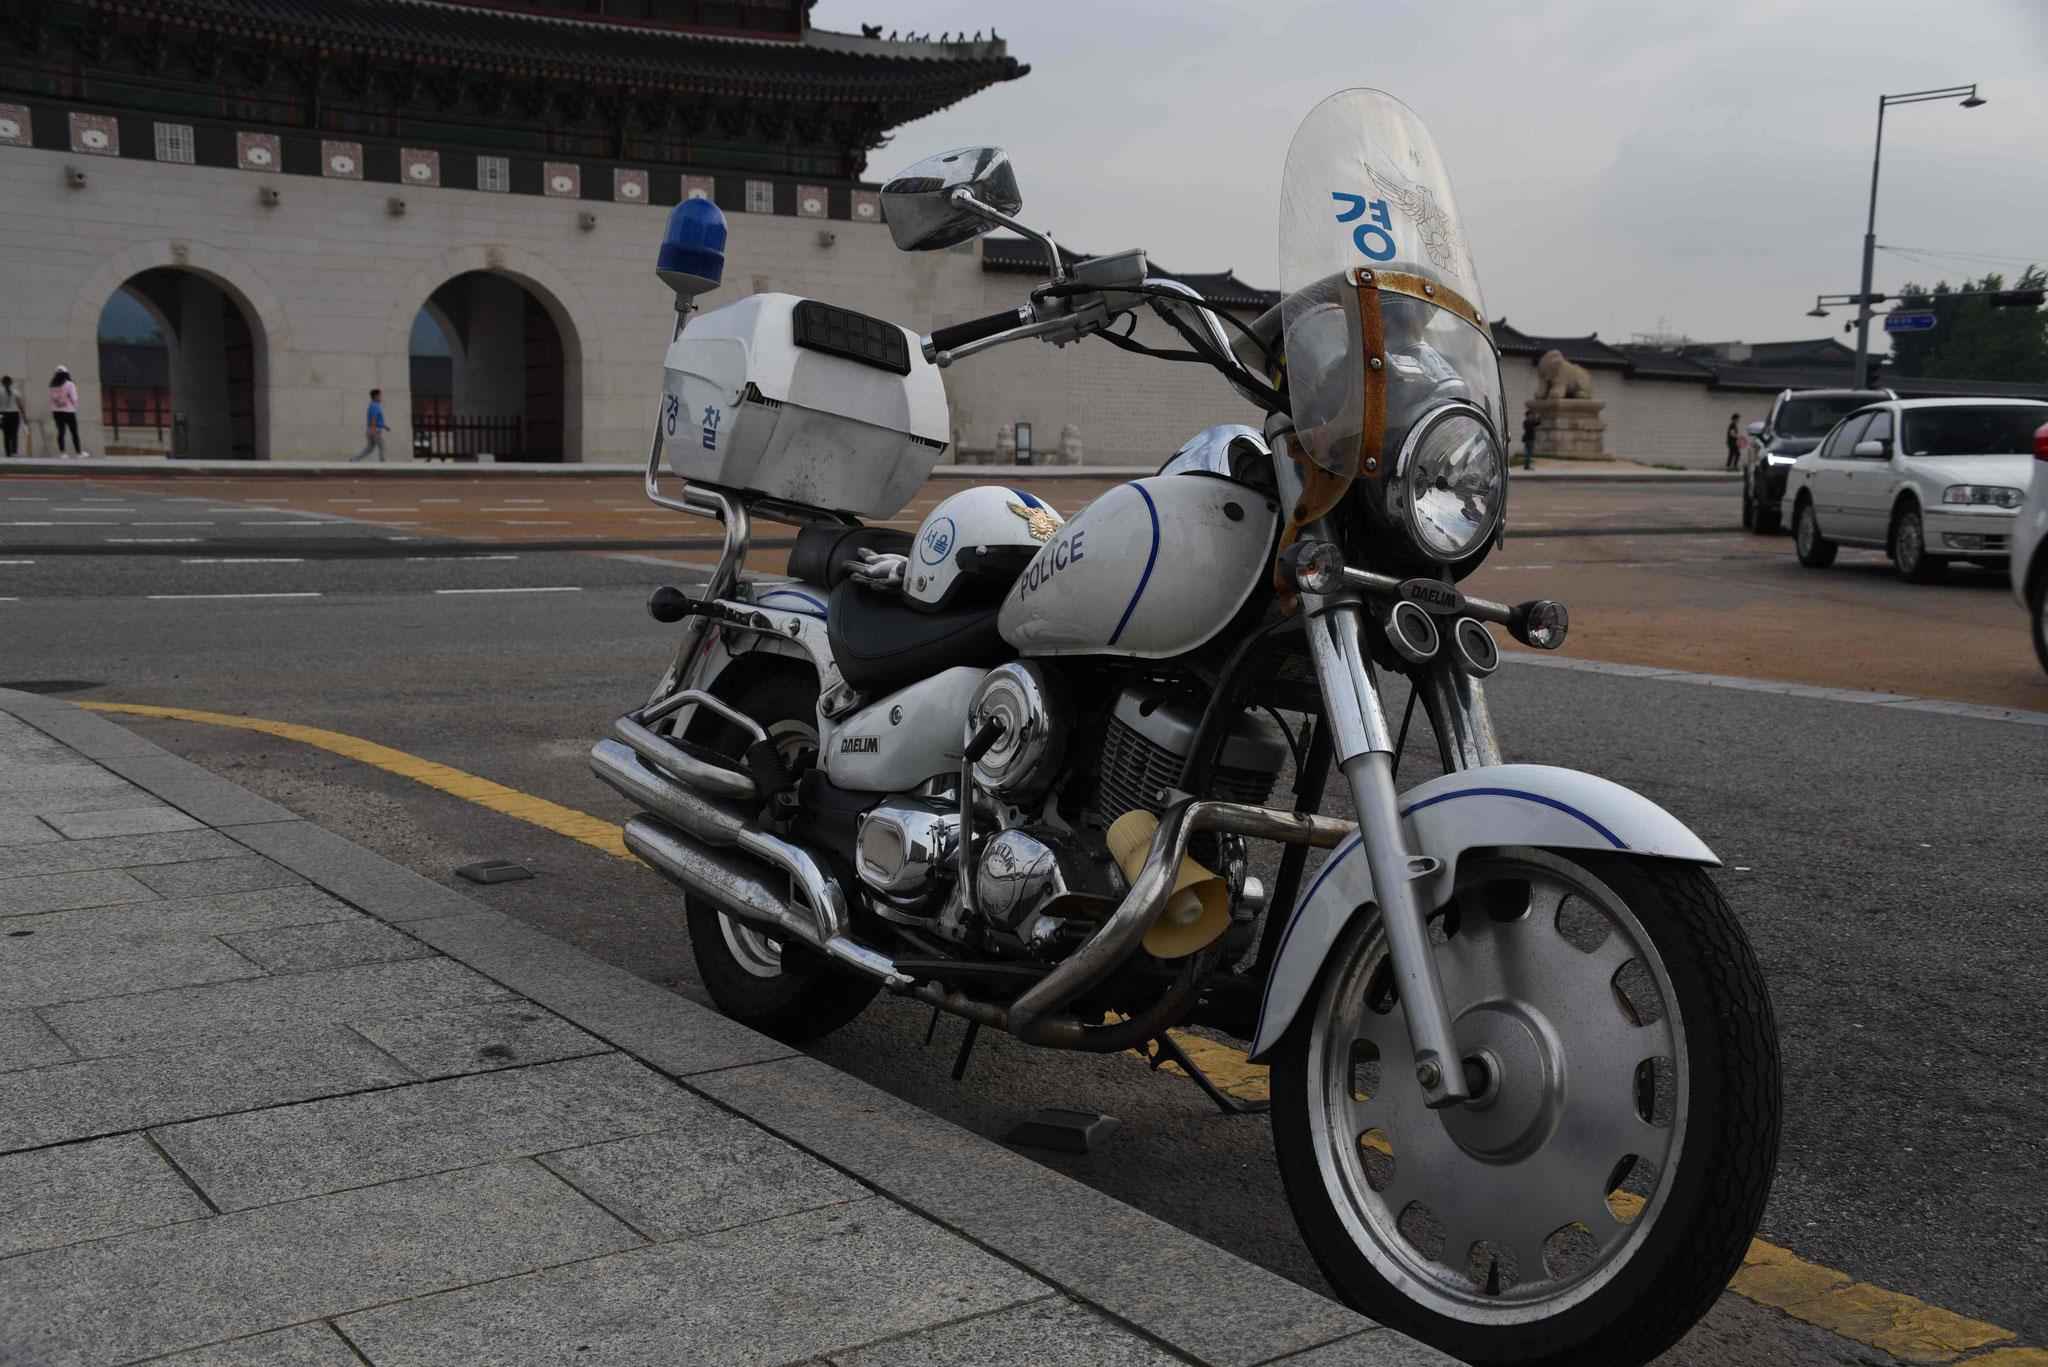 Polizeimotorad